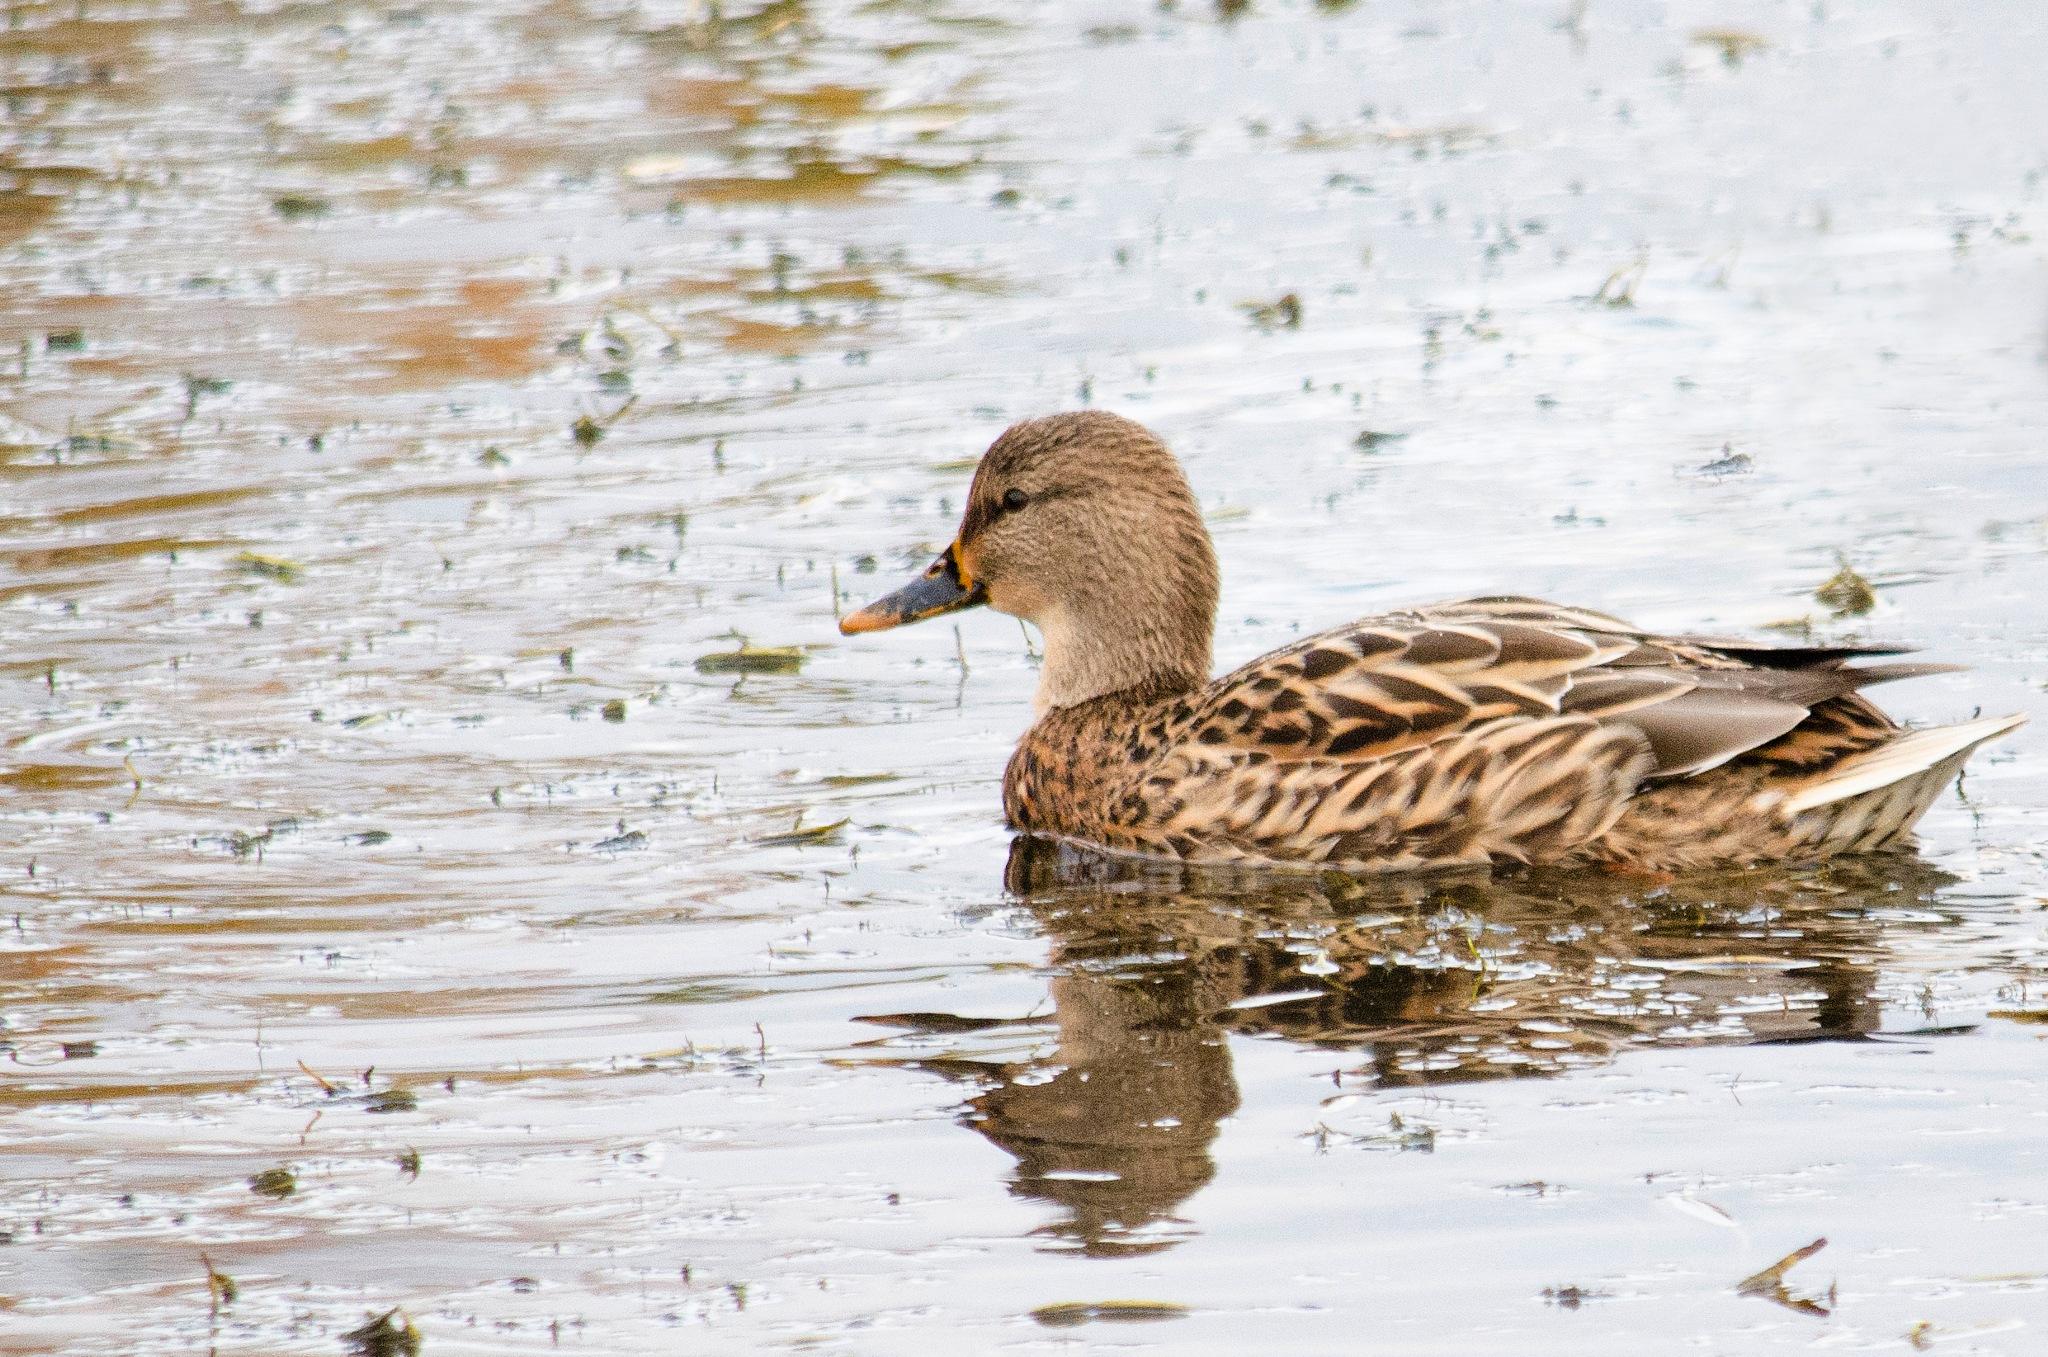 Raining on a Quacker by MattAubin